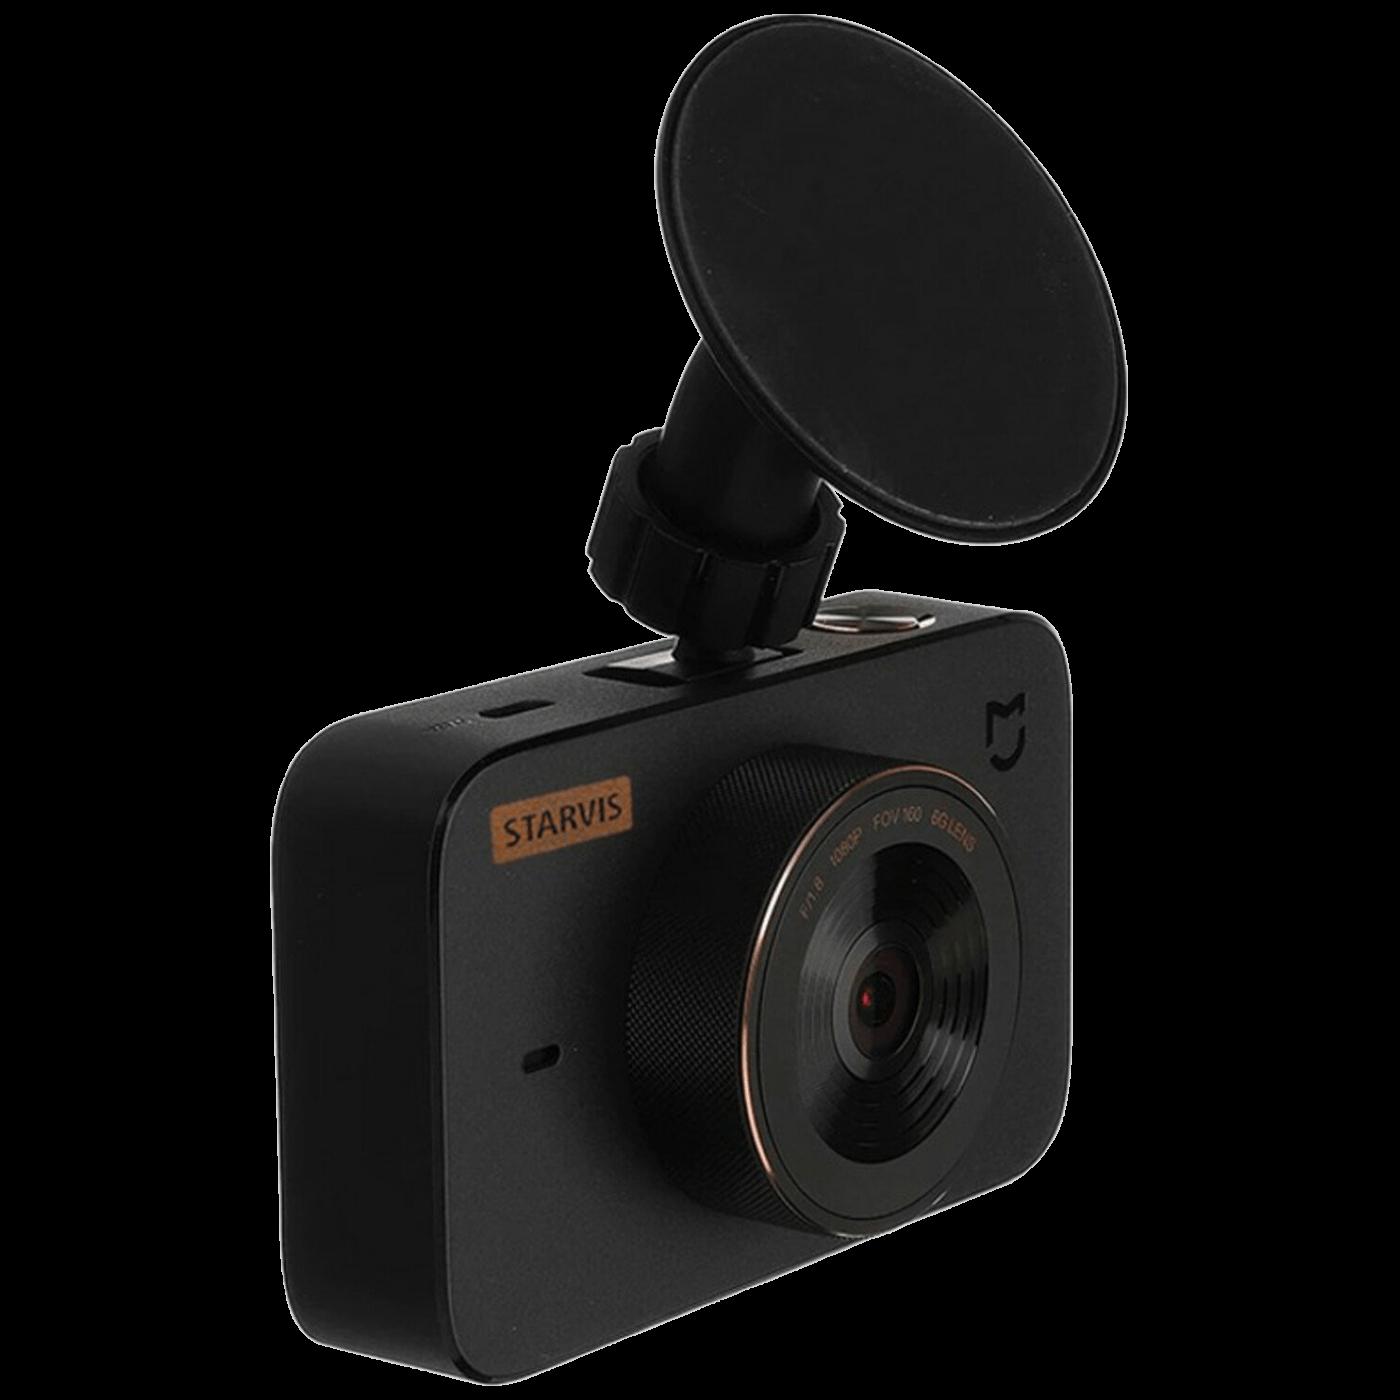 Auto kamera, Full HD, WiFi, IMX307 senzor